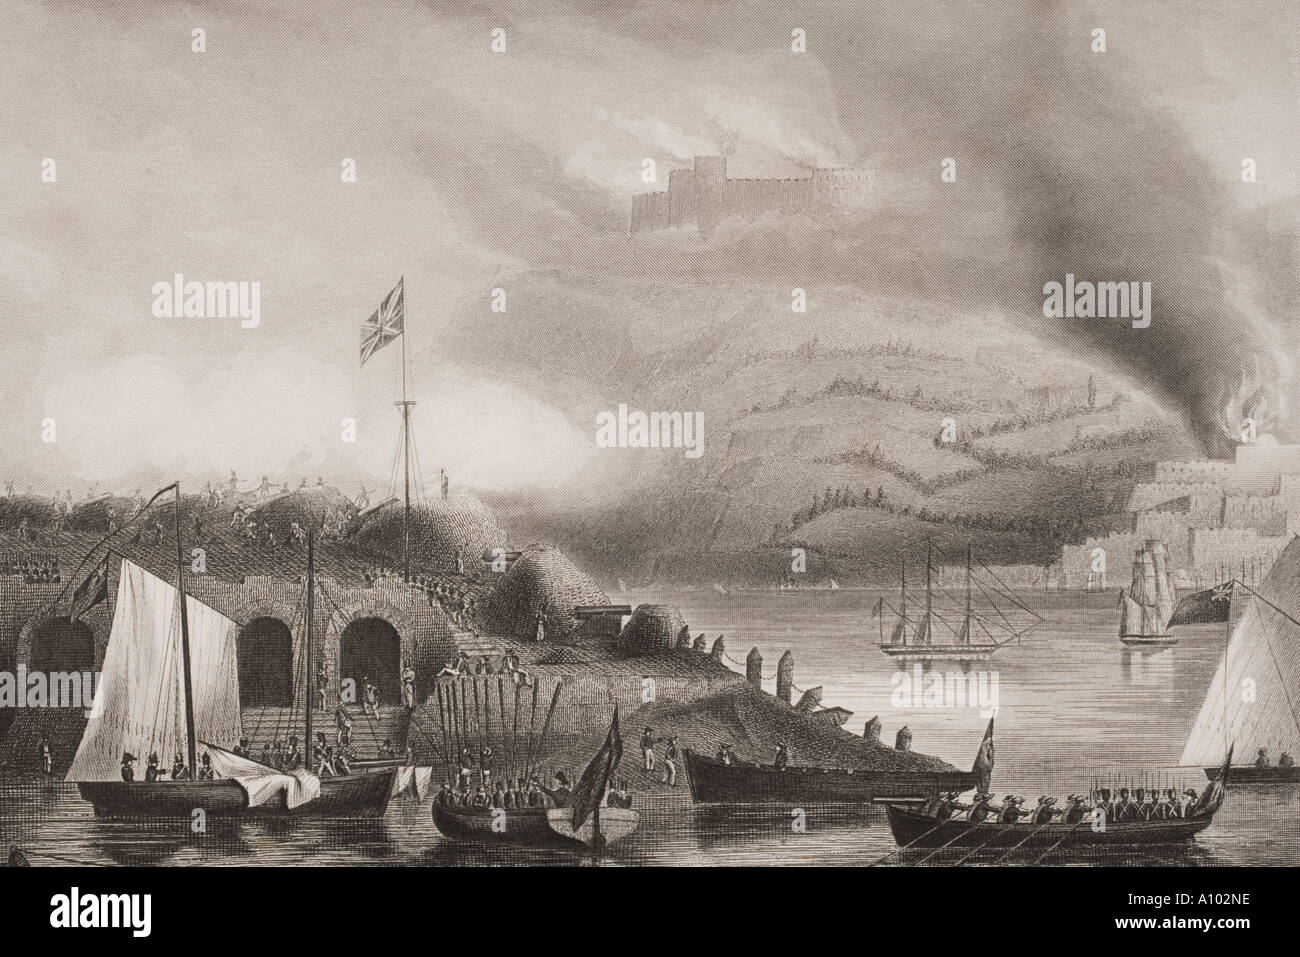 El asalto de San Sebastián, España, 31 de agosto de 1813. Foto de stock